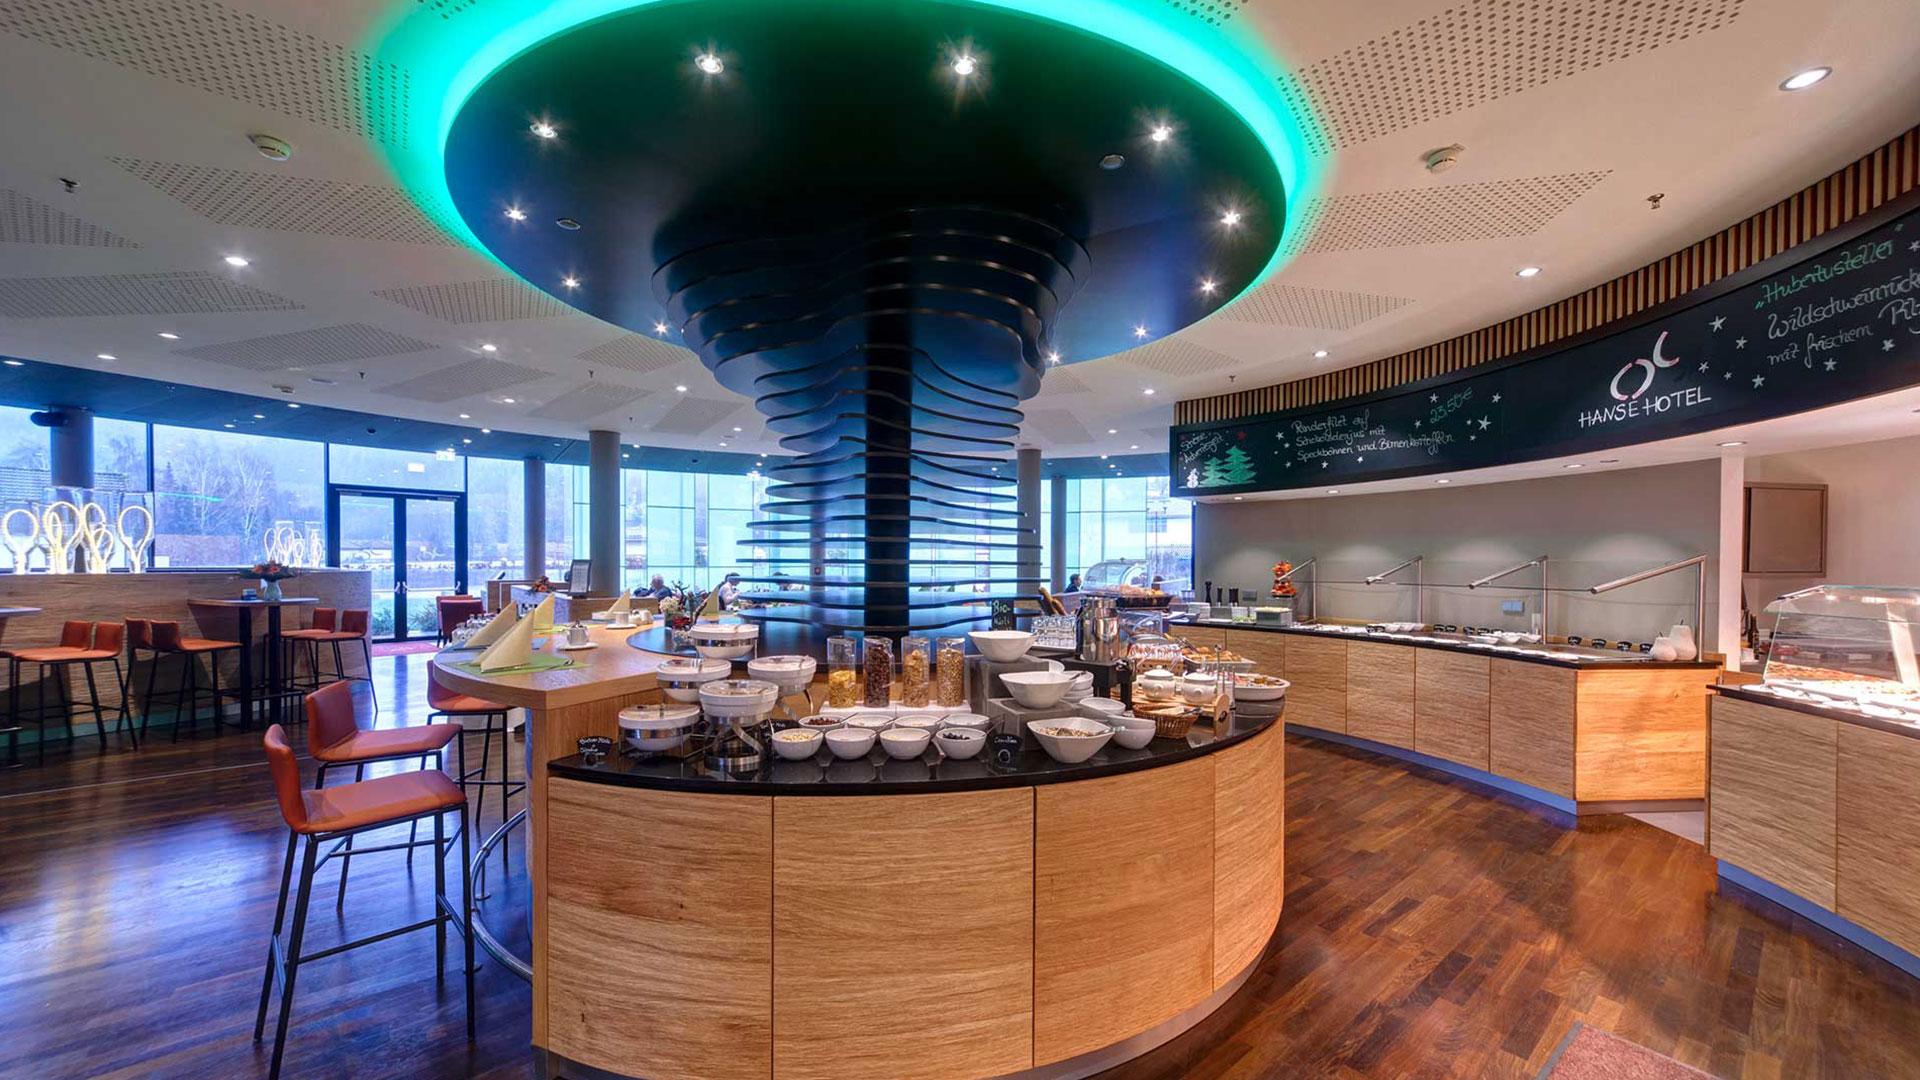 Photo of the breakfast area - 01 - Hanse Hotel Attendorn